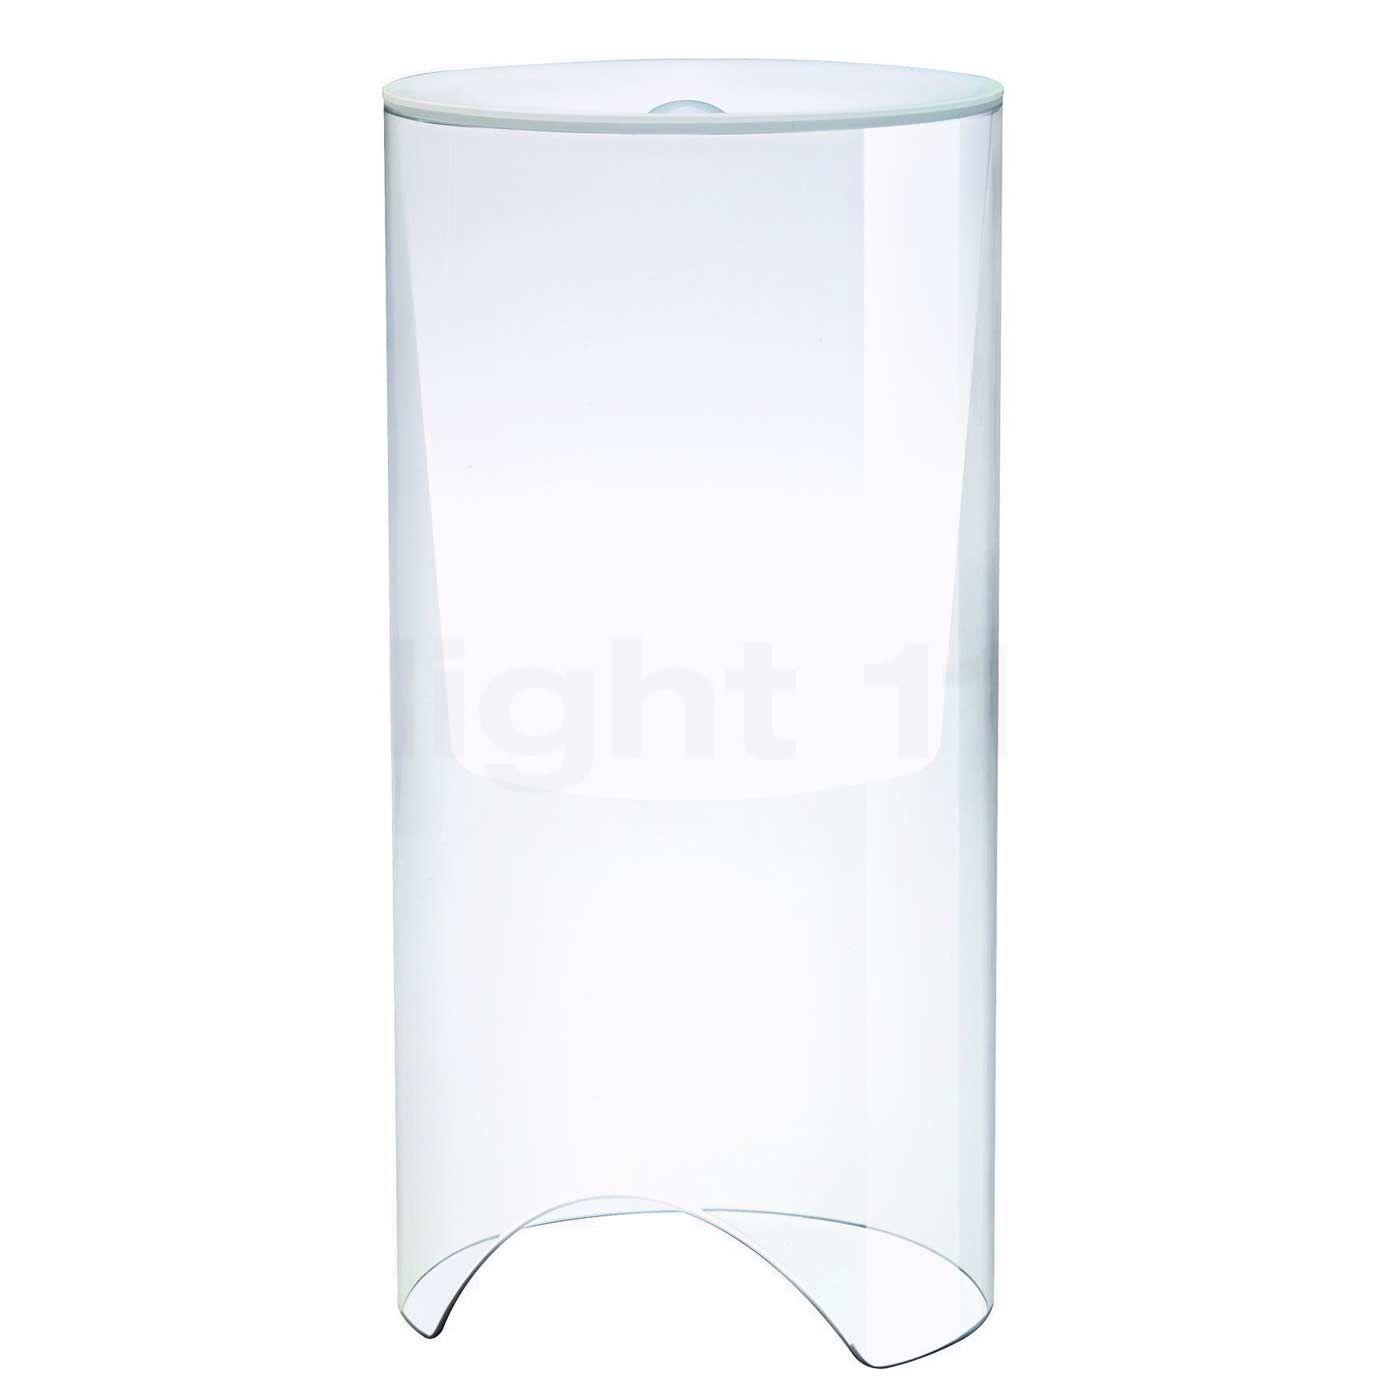 flos aoy lampe de table en vente sur. Black Bedroom Furniture Sets. Home Design Ideas